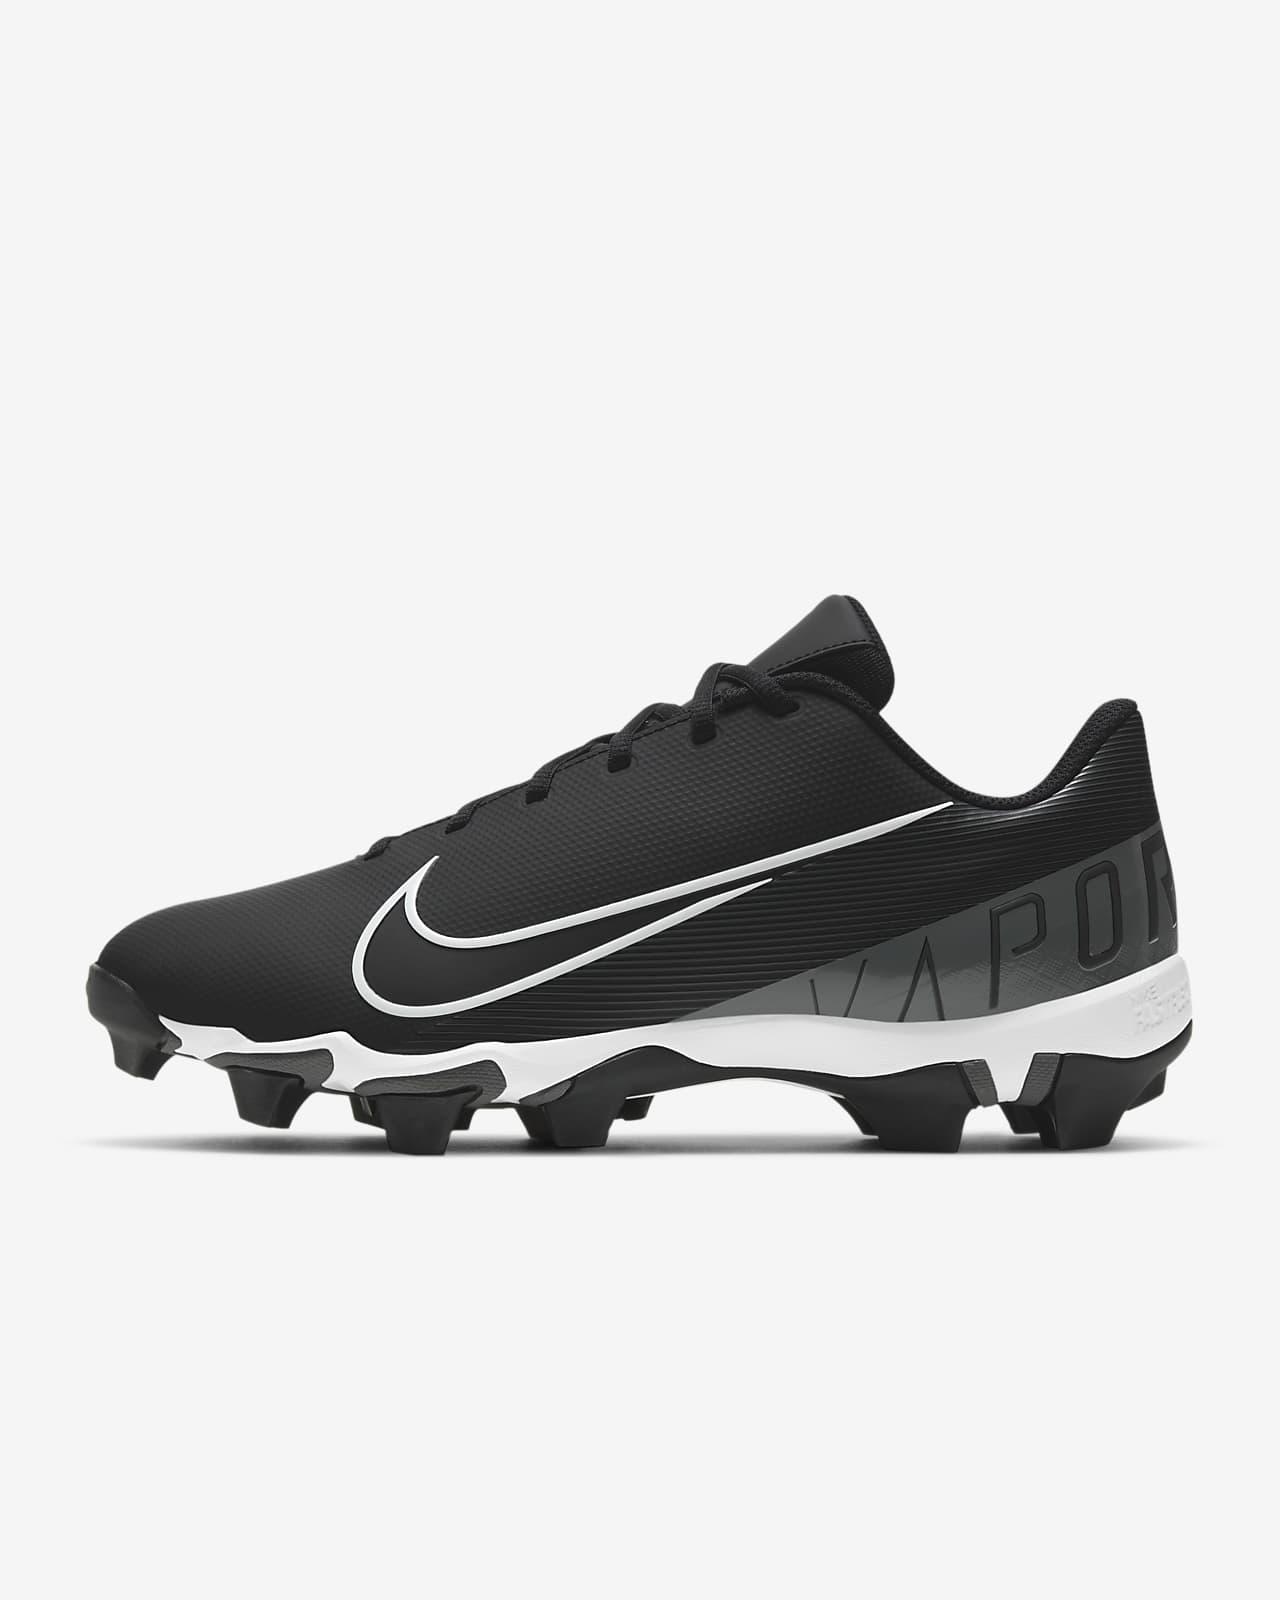 Nike Vapor Ultrafly 3 Keystone Men's Baseball Cleat